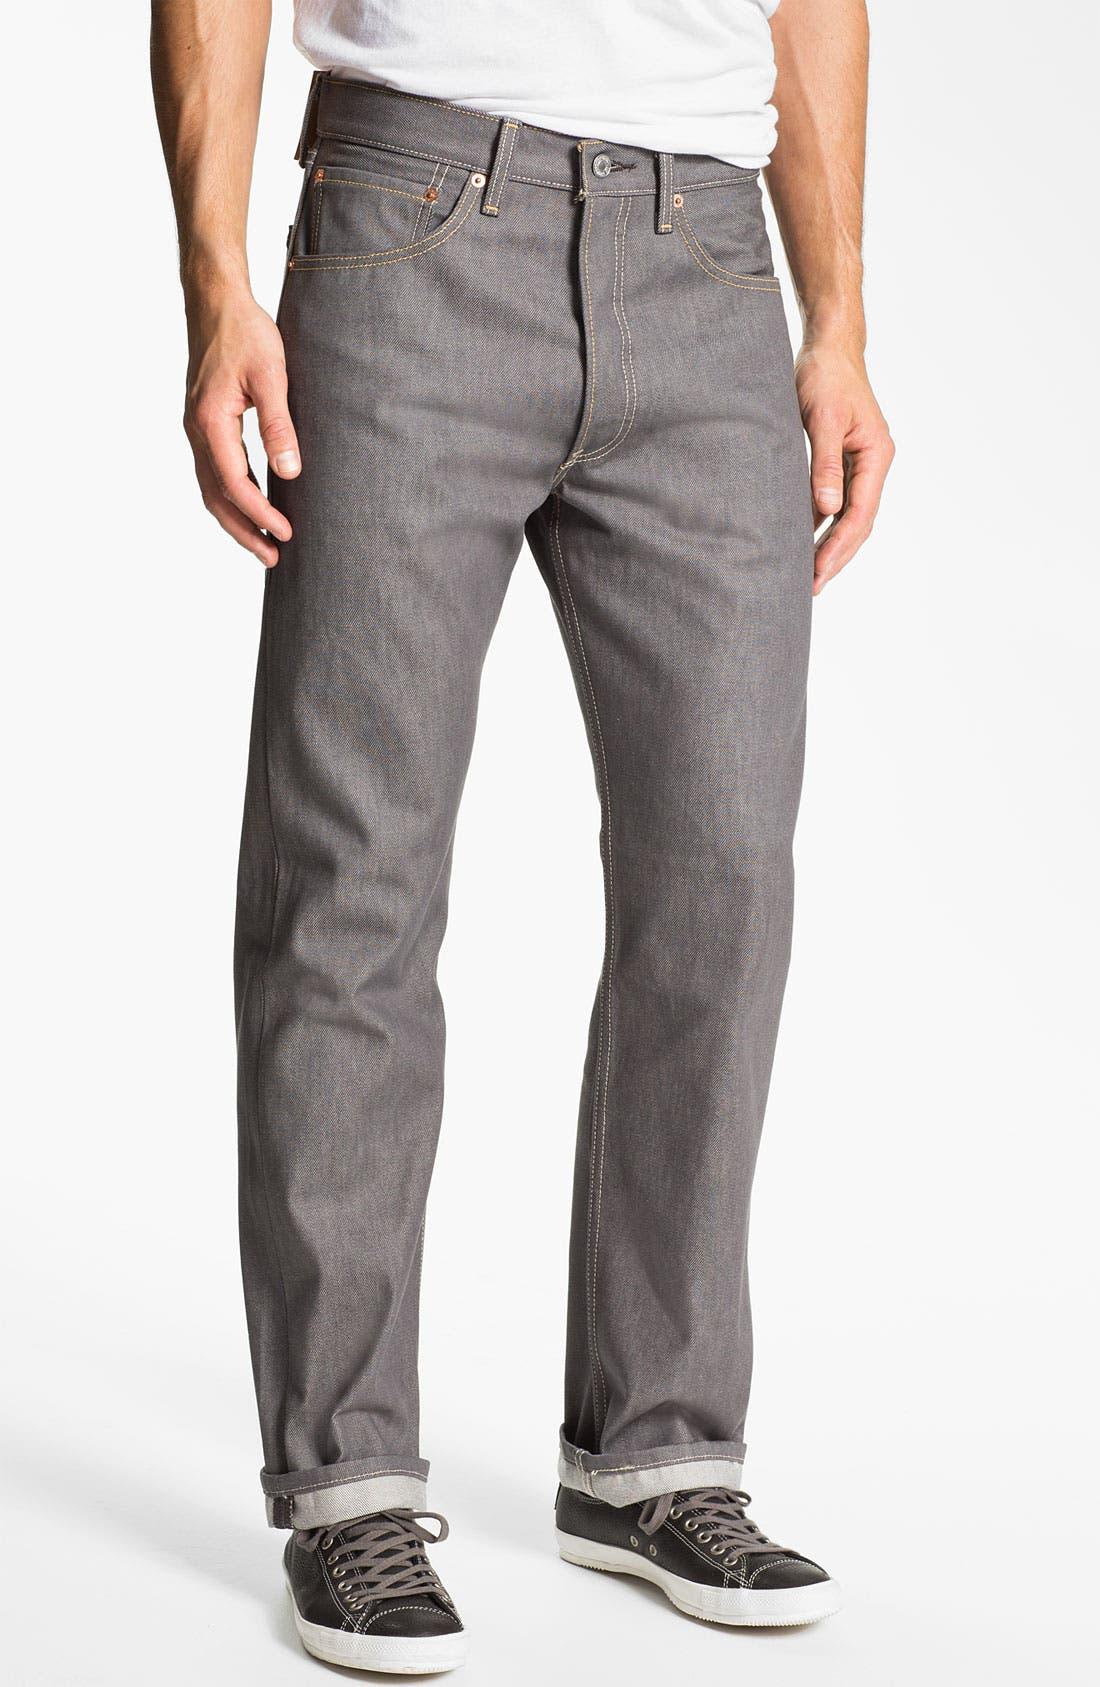 Main Image - Levi's® Red Tab™ 501® Straight Leg Jeans (Grey Rigid) (Regular & Tall)